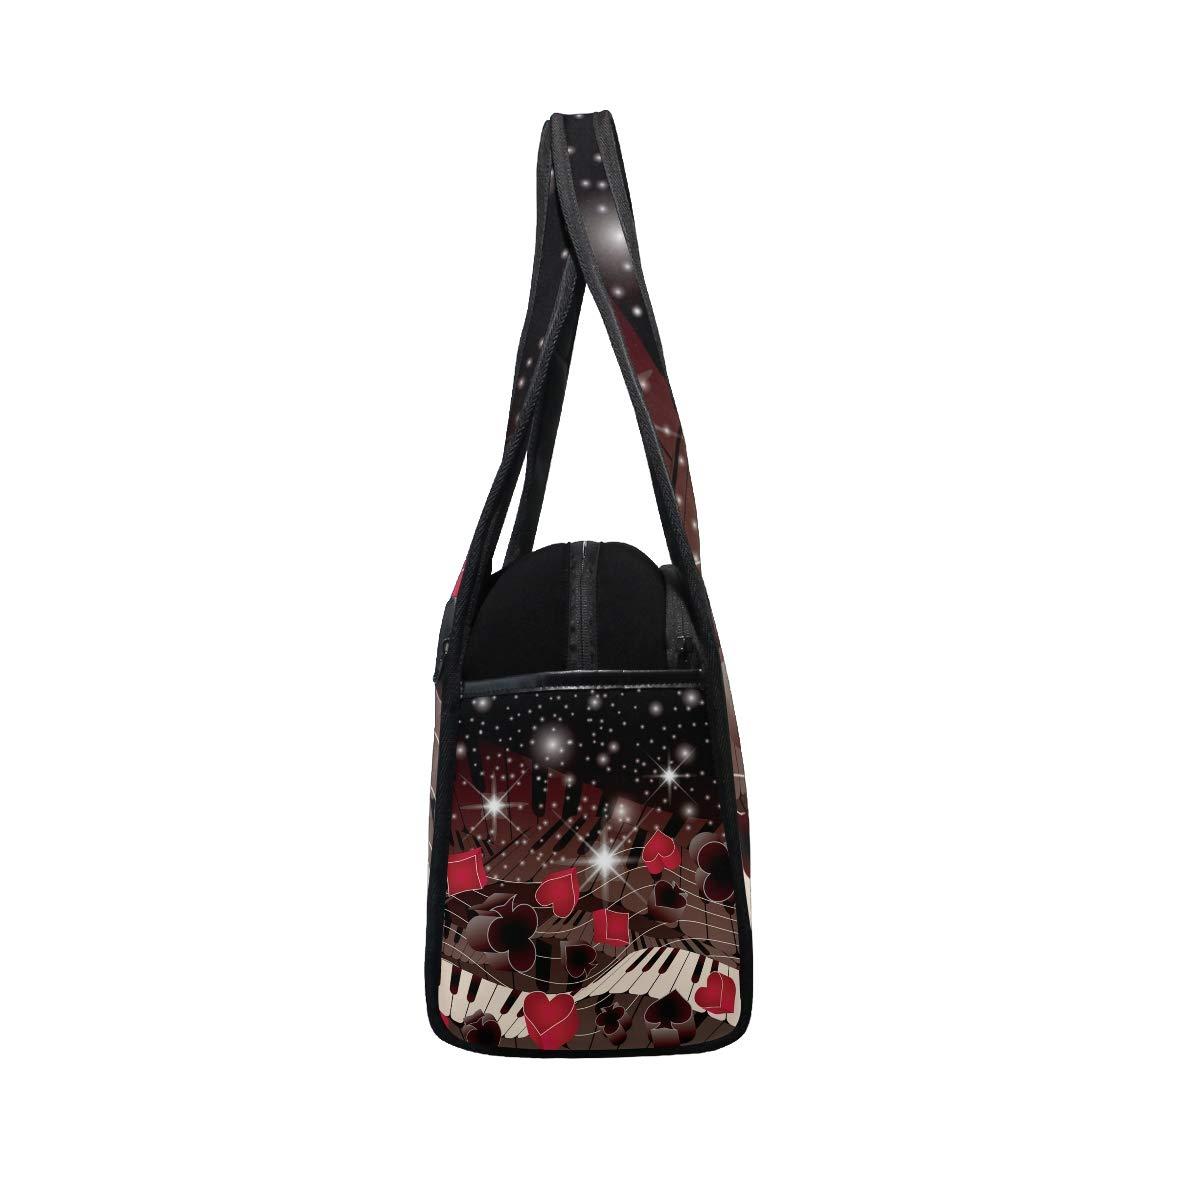 Gym Bag Sports Holdall Poker Melody Canvas Shoulder Bag Overnight Travel Bag for Men and Women